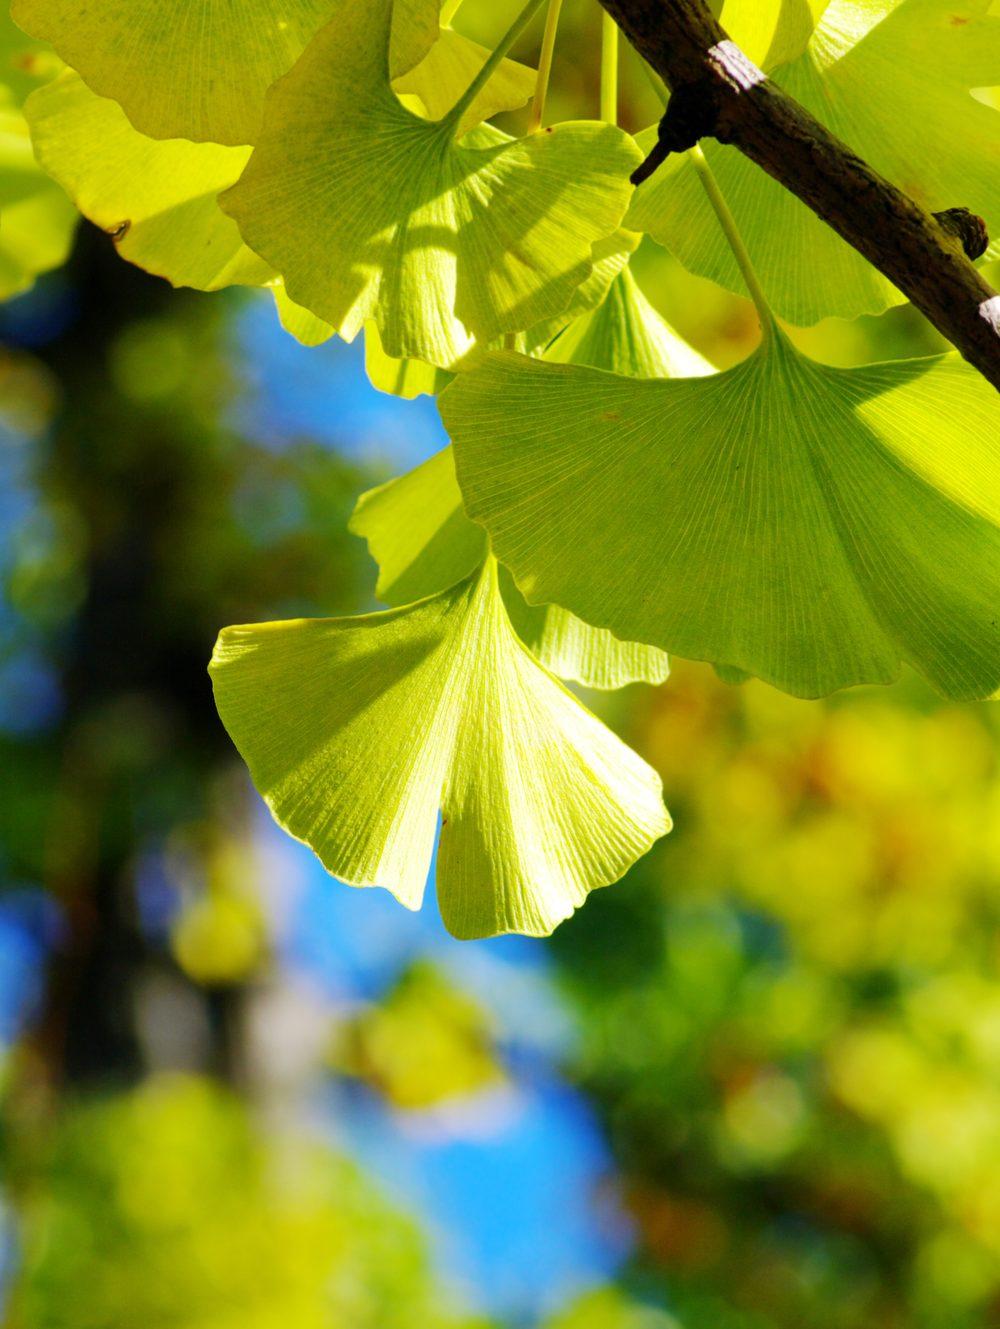 Rhoot Ginko Biloba Herbal Tea Recipe for Memory